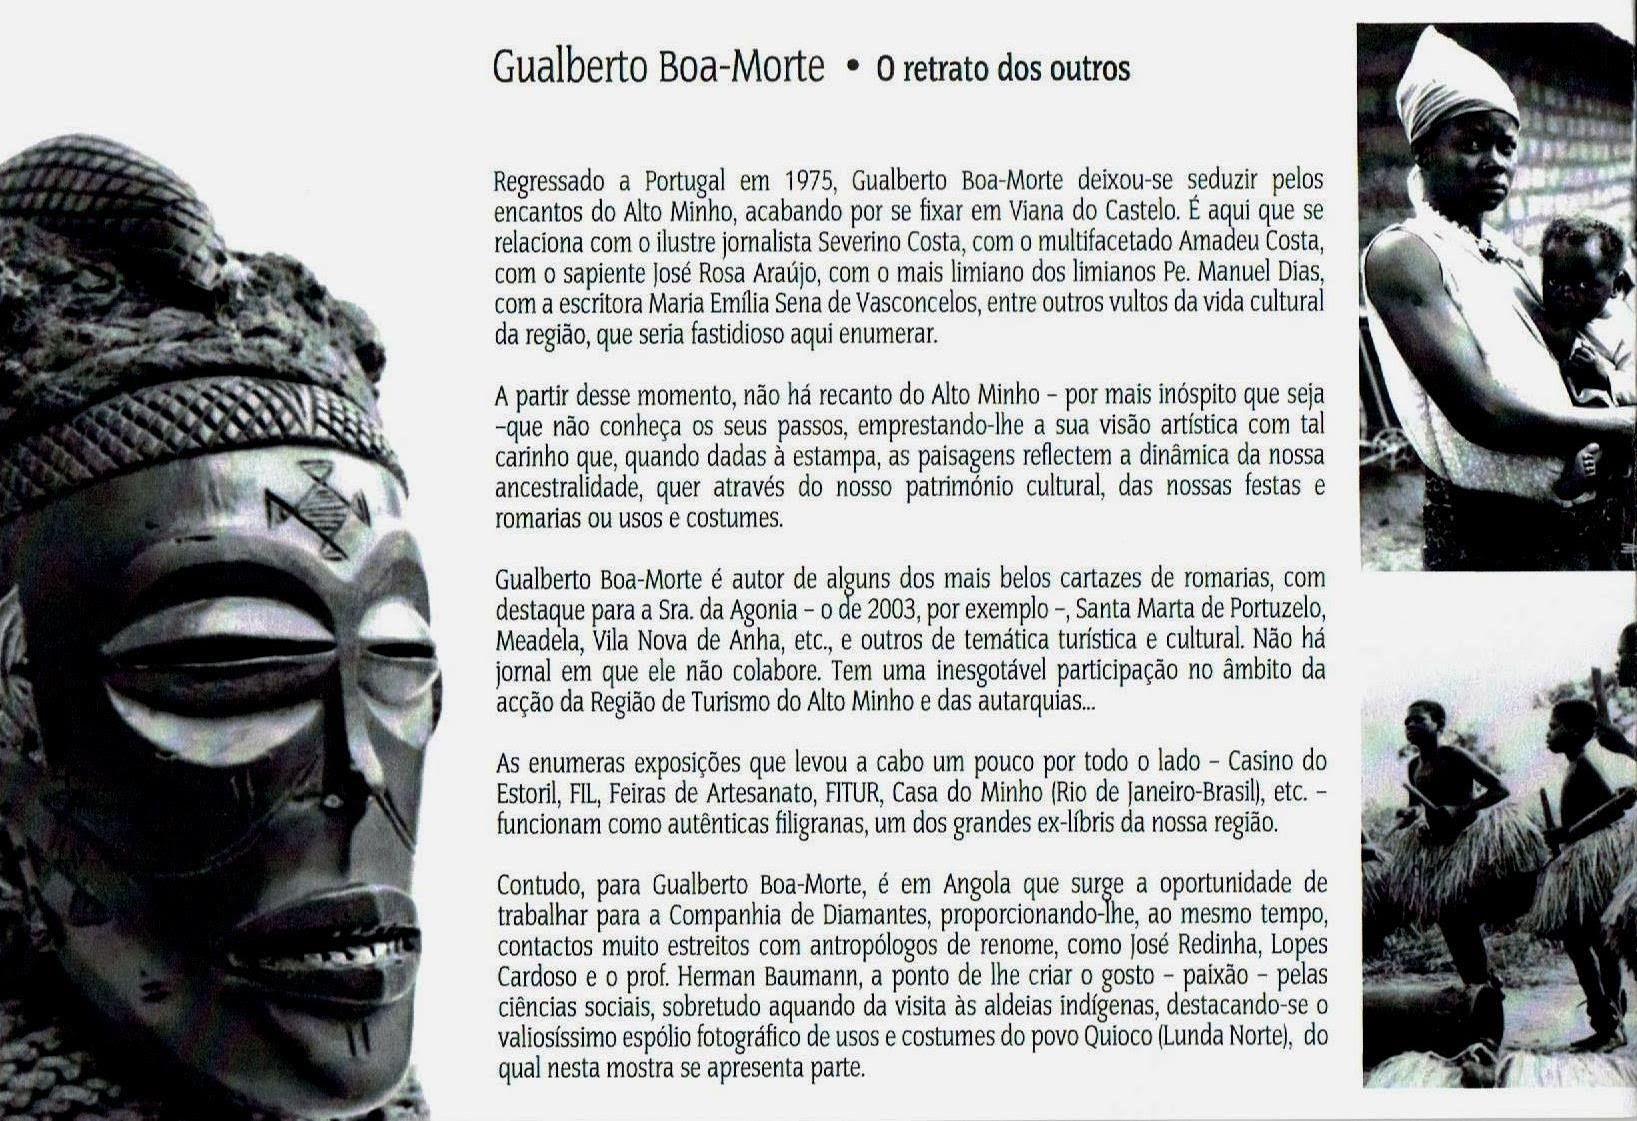 https://sites.google.com/a/centroculturaldoaltominho.org/ccam/actividades-realizadas/2015/realizacoes-actividades/_draft_post/Imagem2.jpeg.jpeg.jpeg